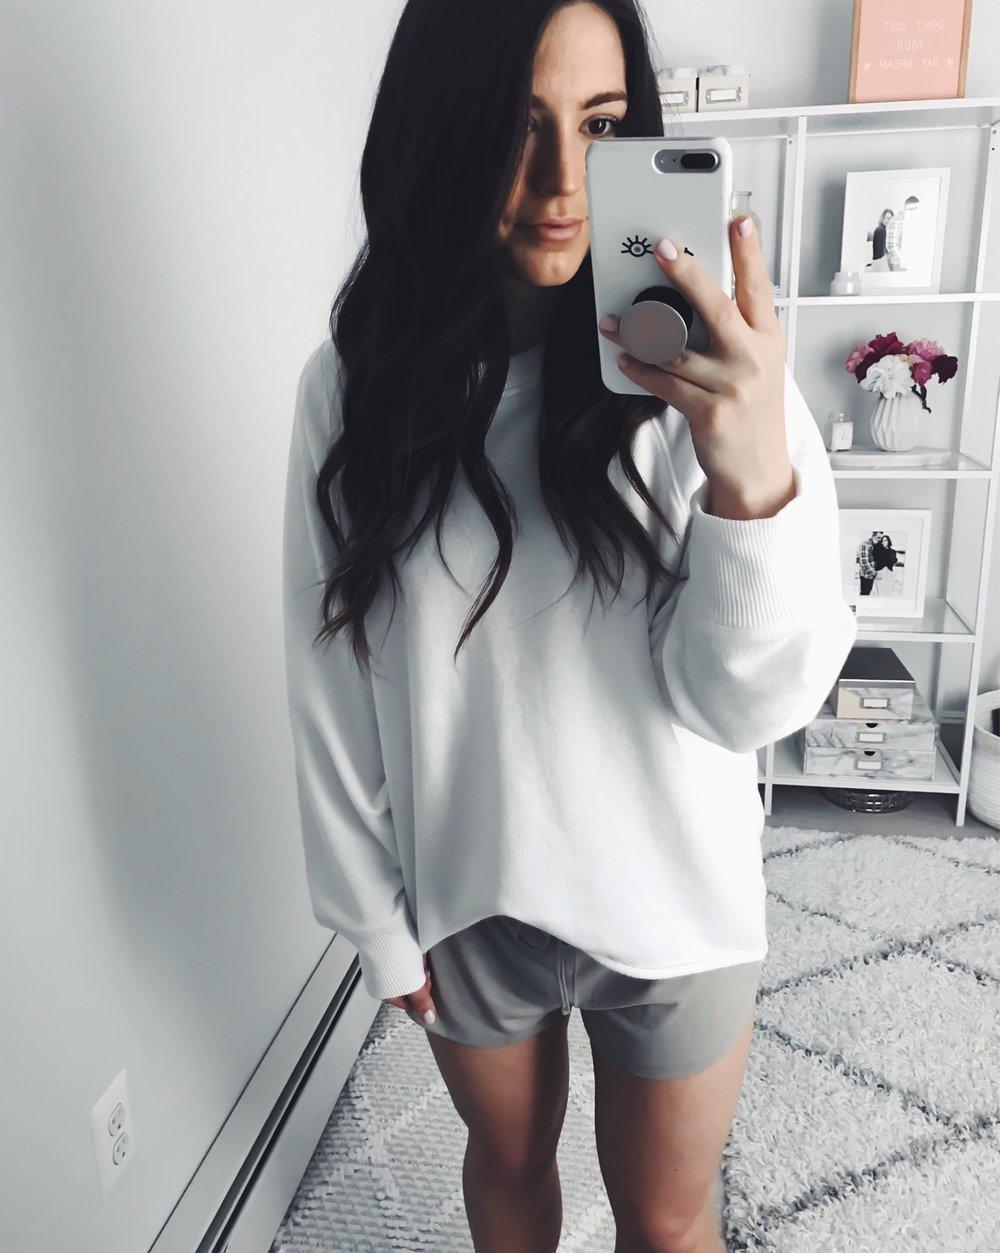 Instagram Round Up | Pine Barren Beauty | cozy outfit idea, aerie sweatshirt, aerie shorts, lounge wear